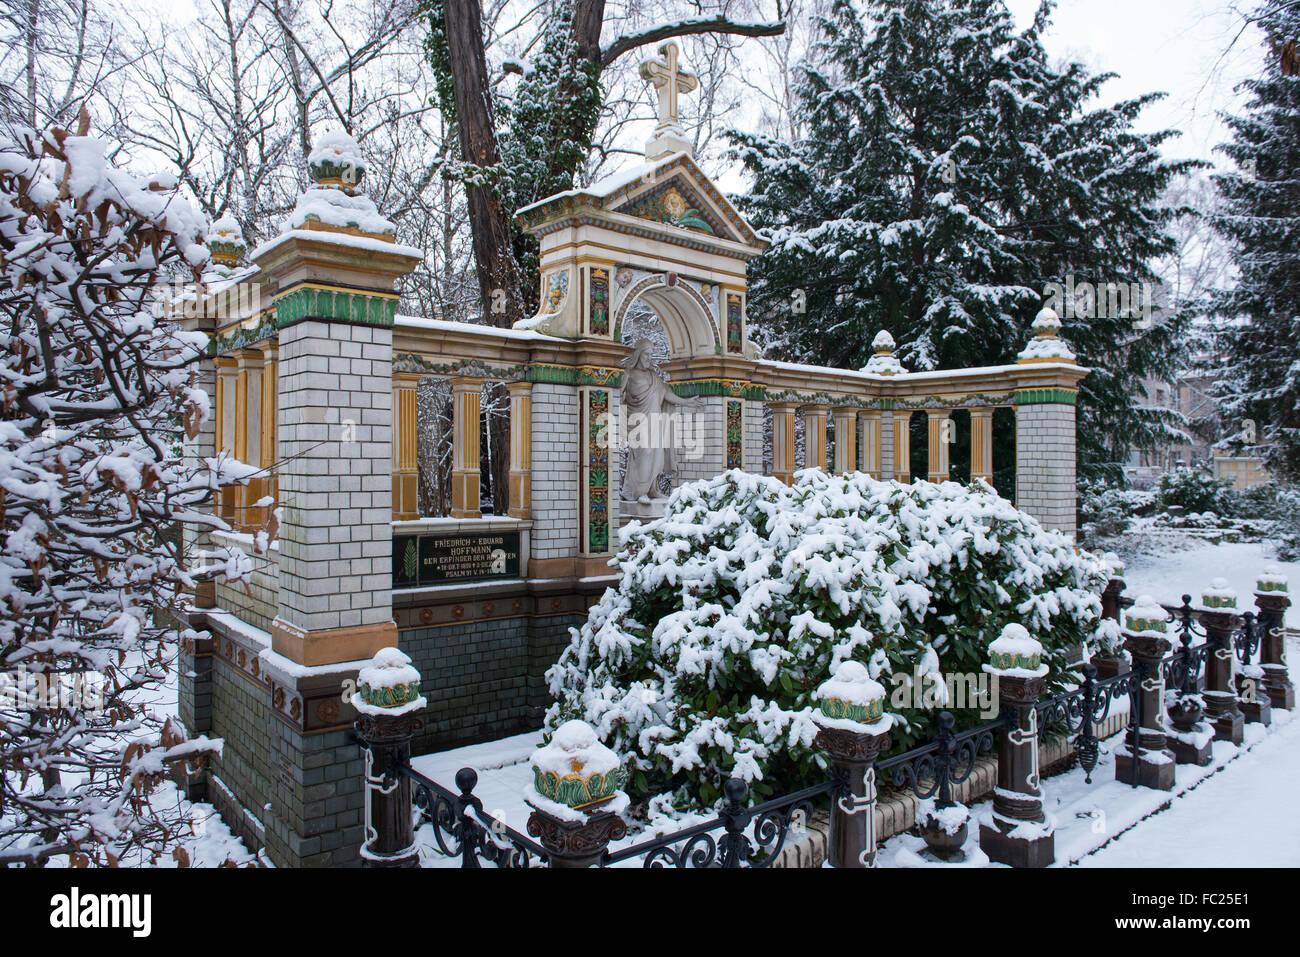 Dorotheenstadt cemetery Berlin,grave of Eduard Friedrich Hoffmann, Germany - Stock Image